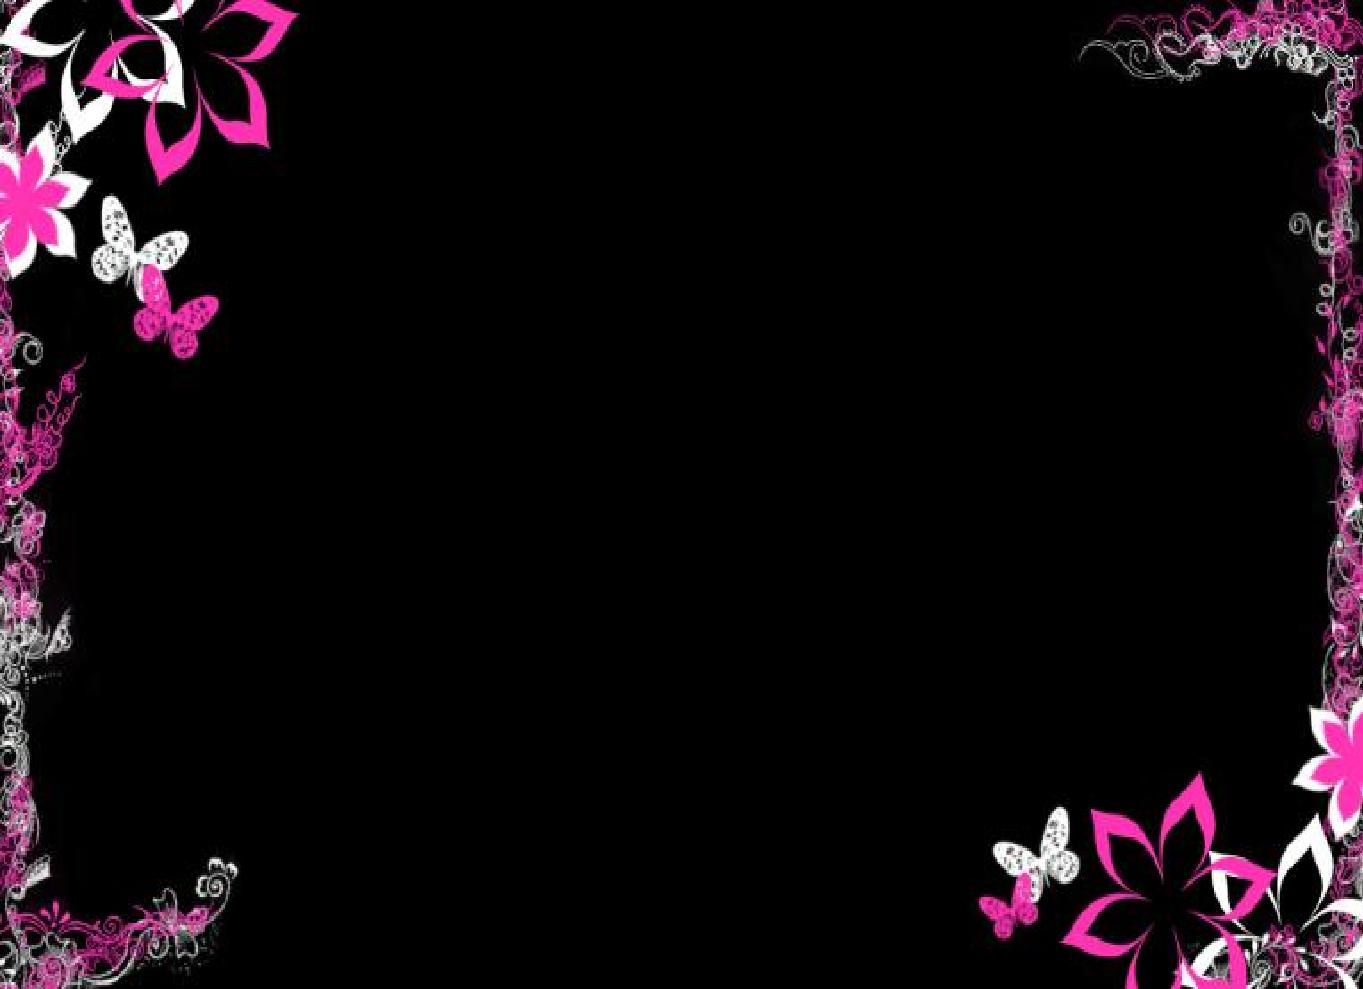 Fast Five Wallpaper: Best Emo Desktop Wallpapers And